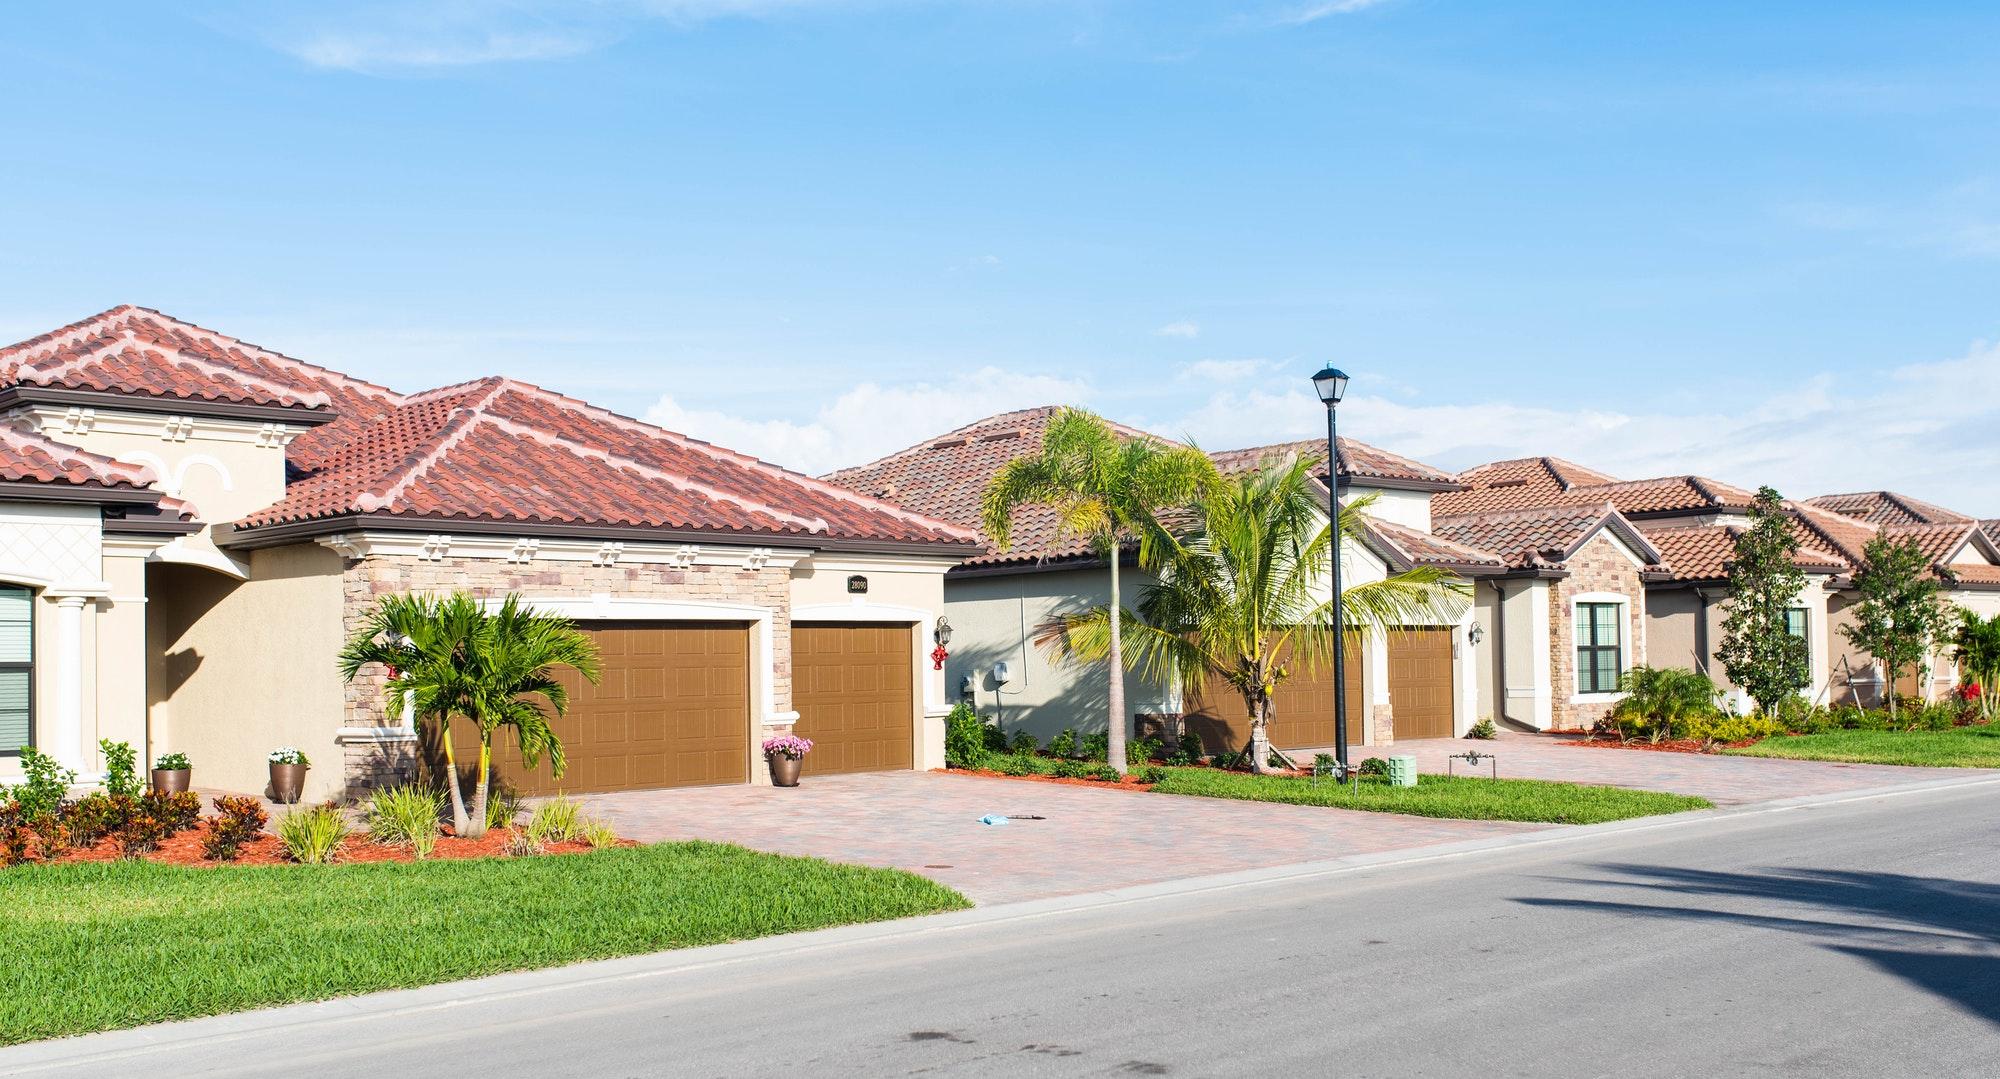 Florida golf community houses background. Bonita Springs, Florida